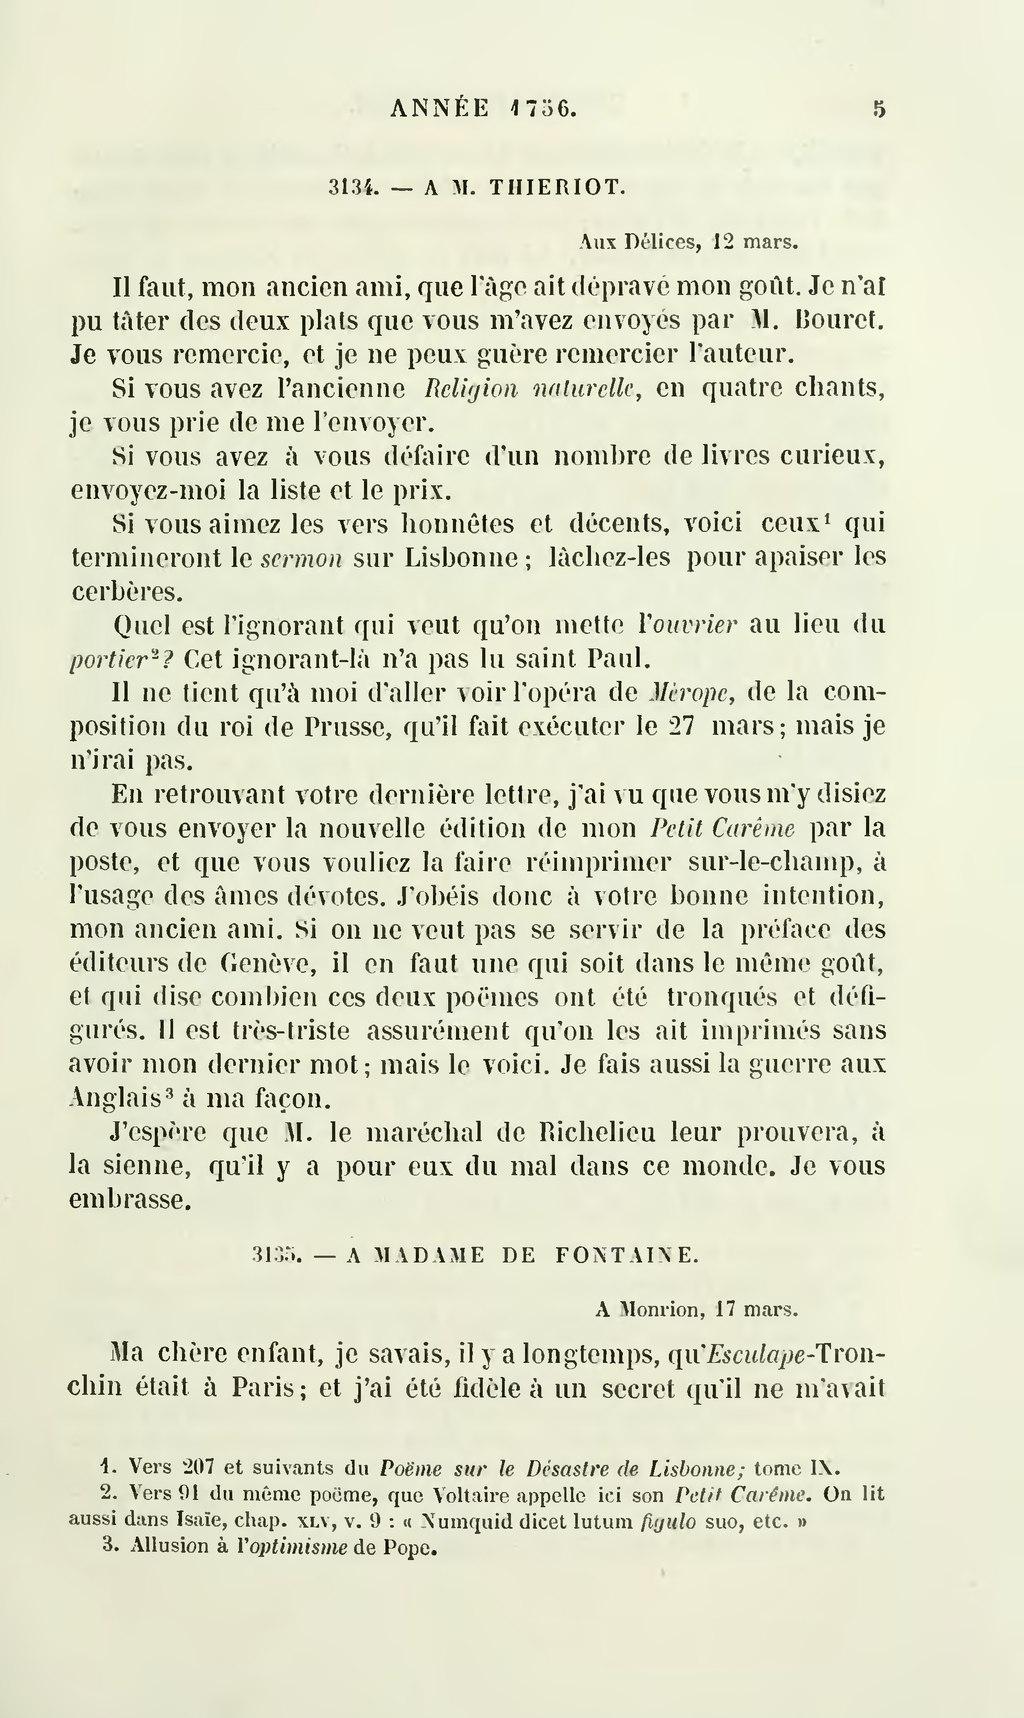 Pagevoltaire œuvres Complètes Garnier Tome39djvu15